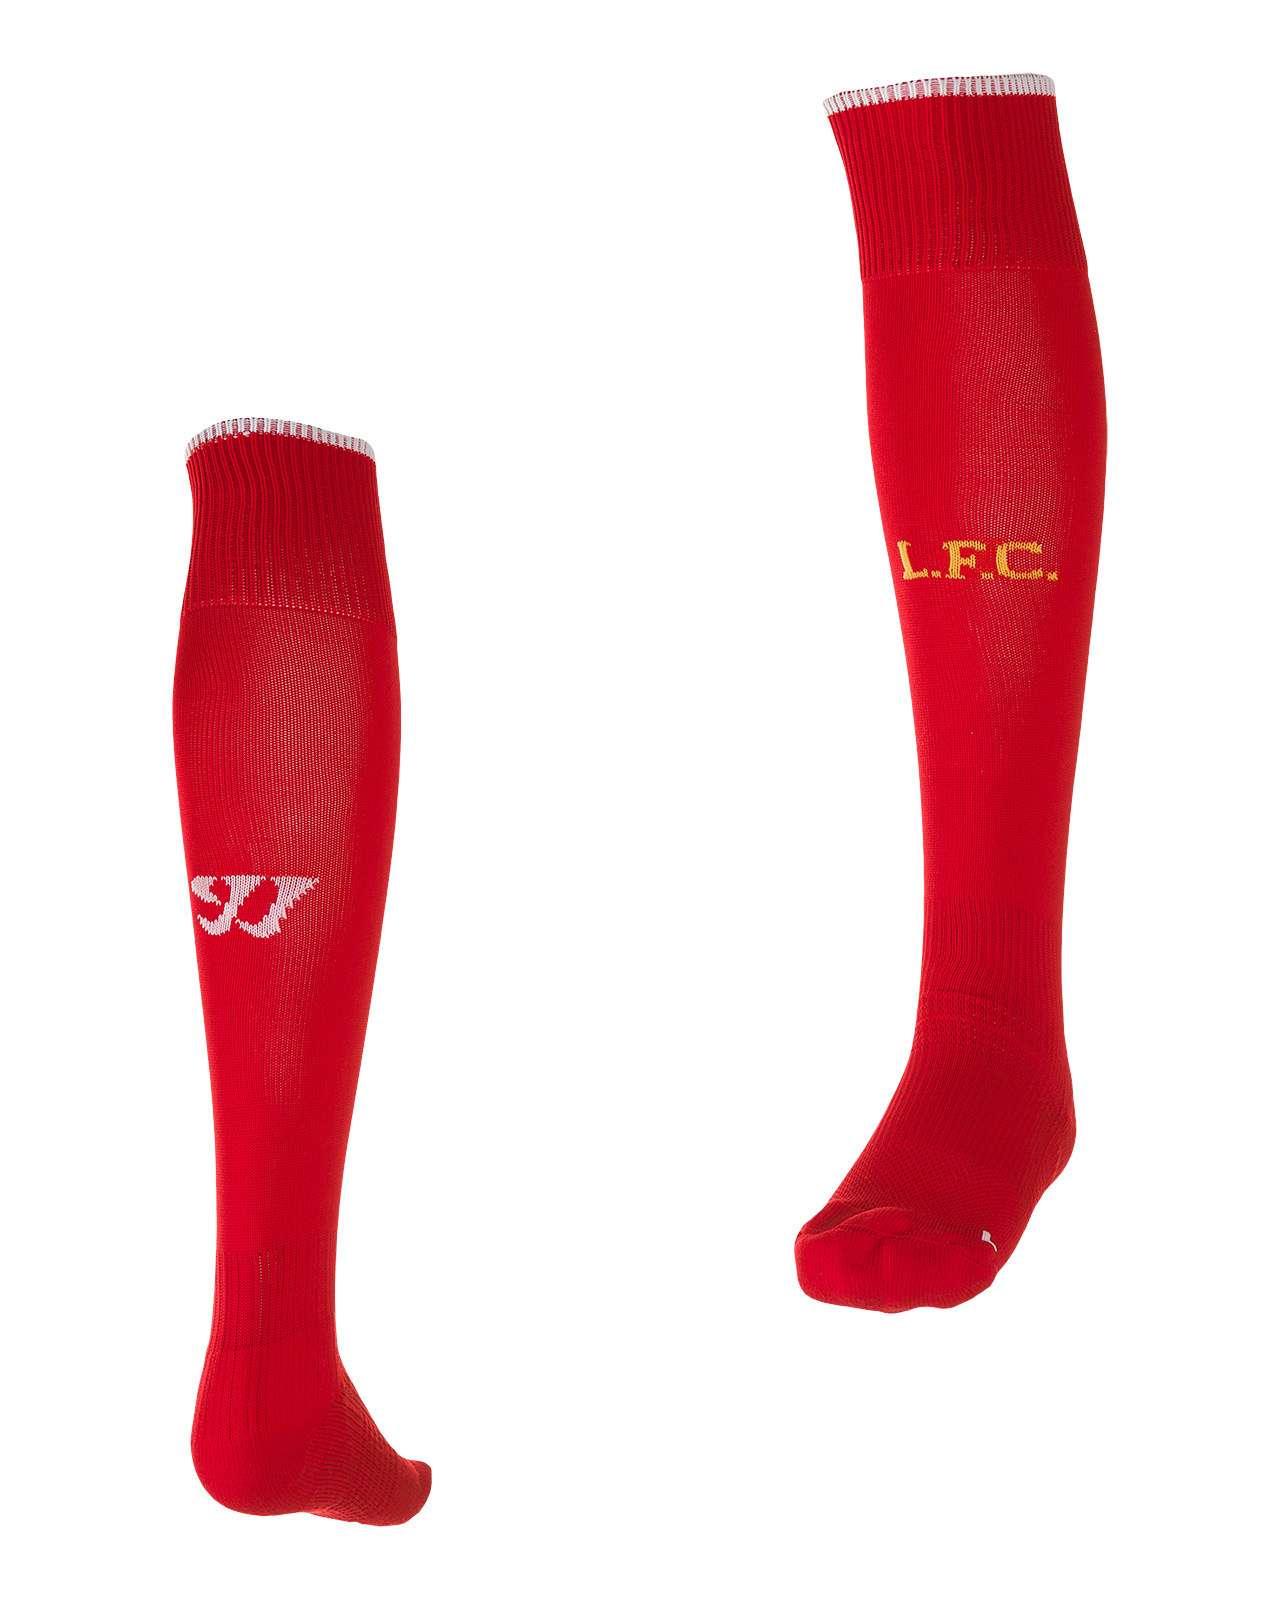 Warrior Sports Liverpool 2014 Home Socks